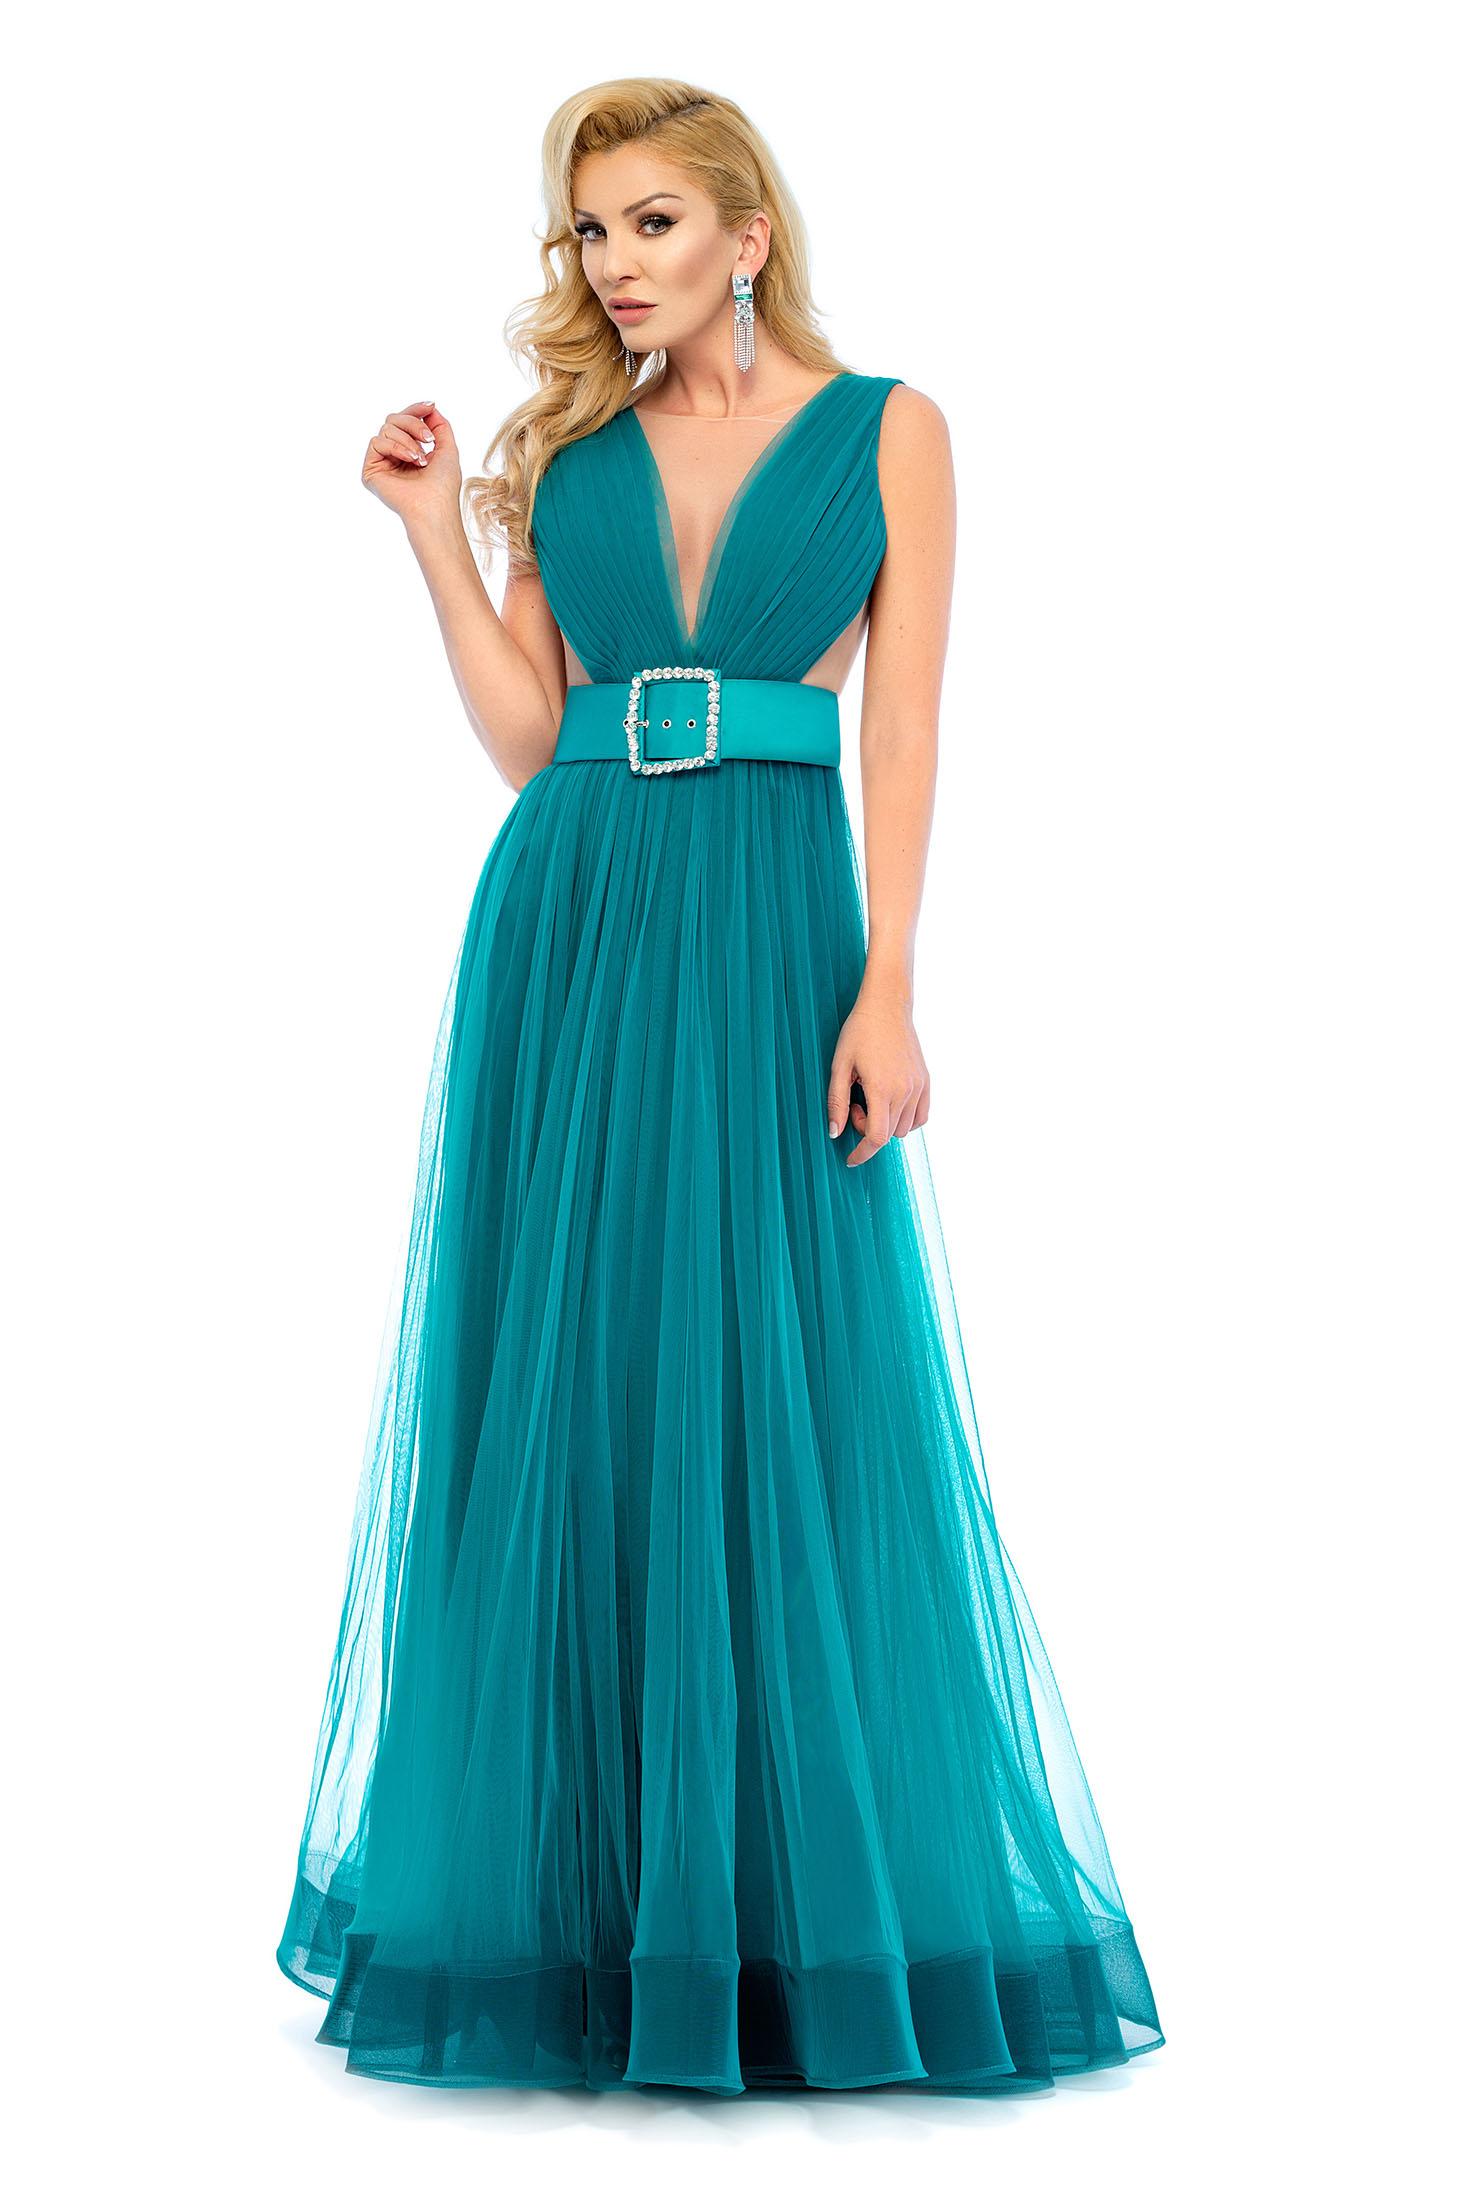 Turquoise evening dresses Ana Radu dress accessorized with belt